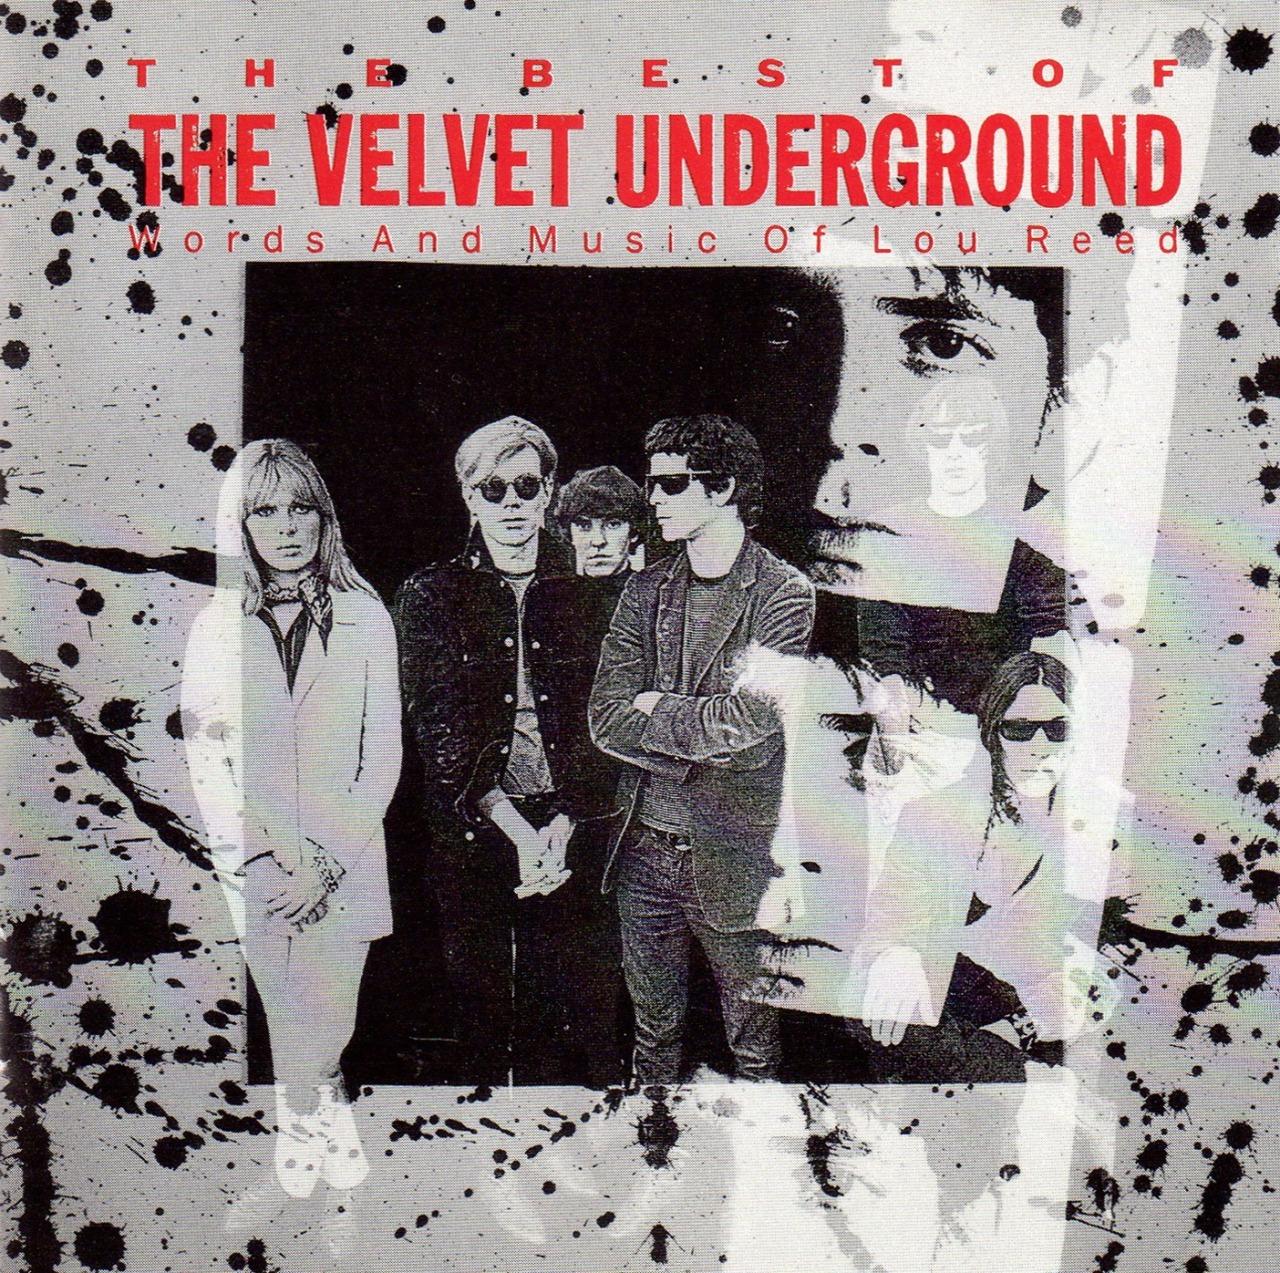 The Velvet Underground #The Velvet Underground #Nico#Andy Warhol#Maureen Tucker#Lou Reed#Sterling Morrison#John Cale